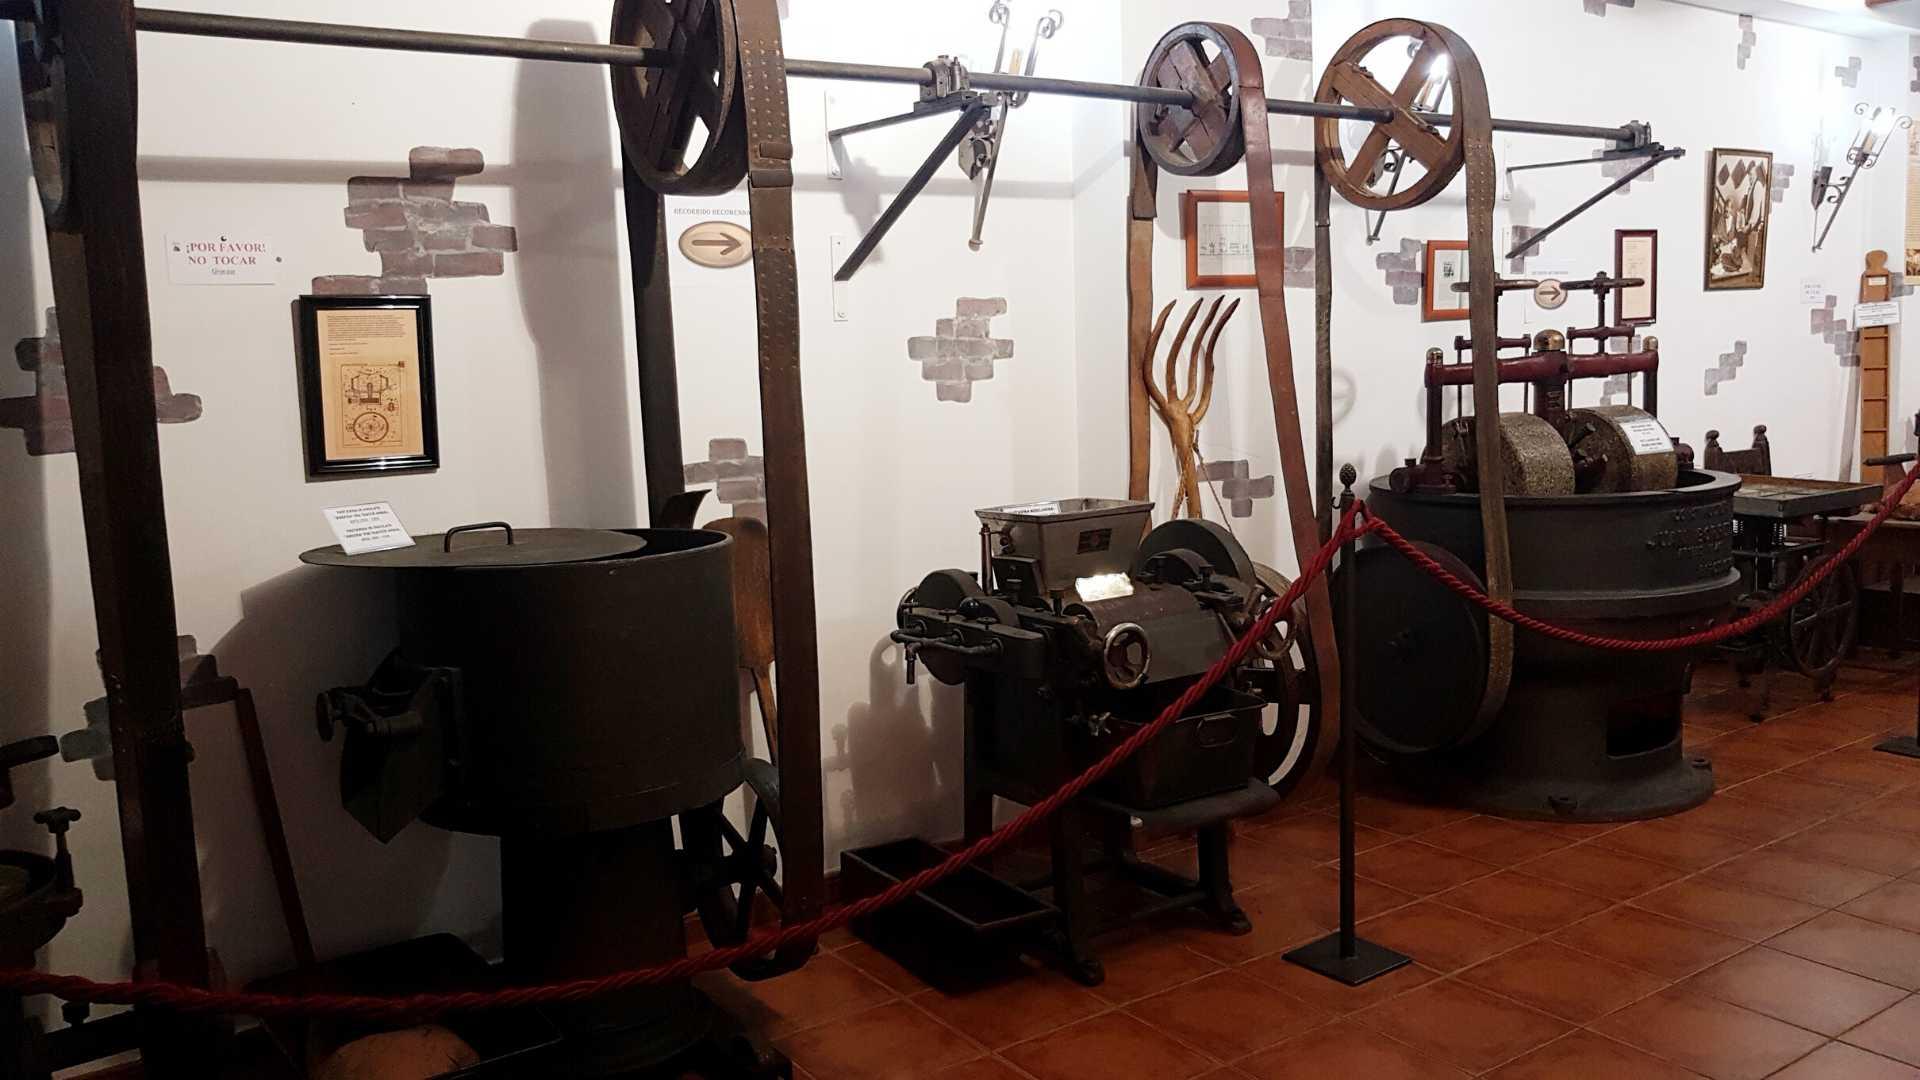 Visita guiada al Museu del Xocolate